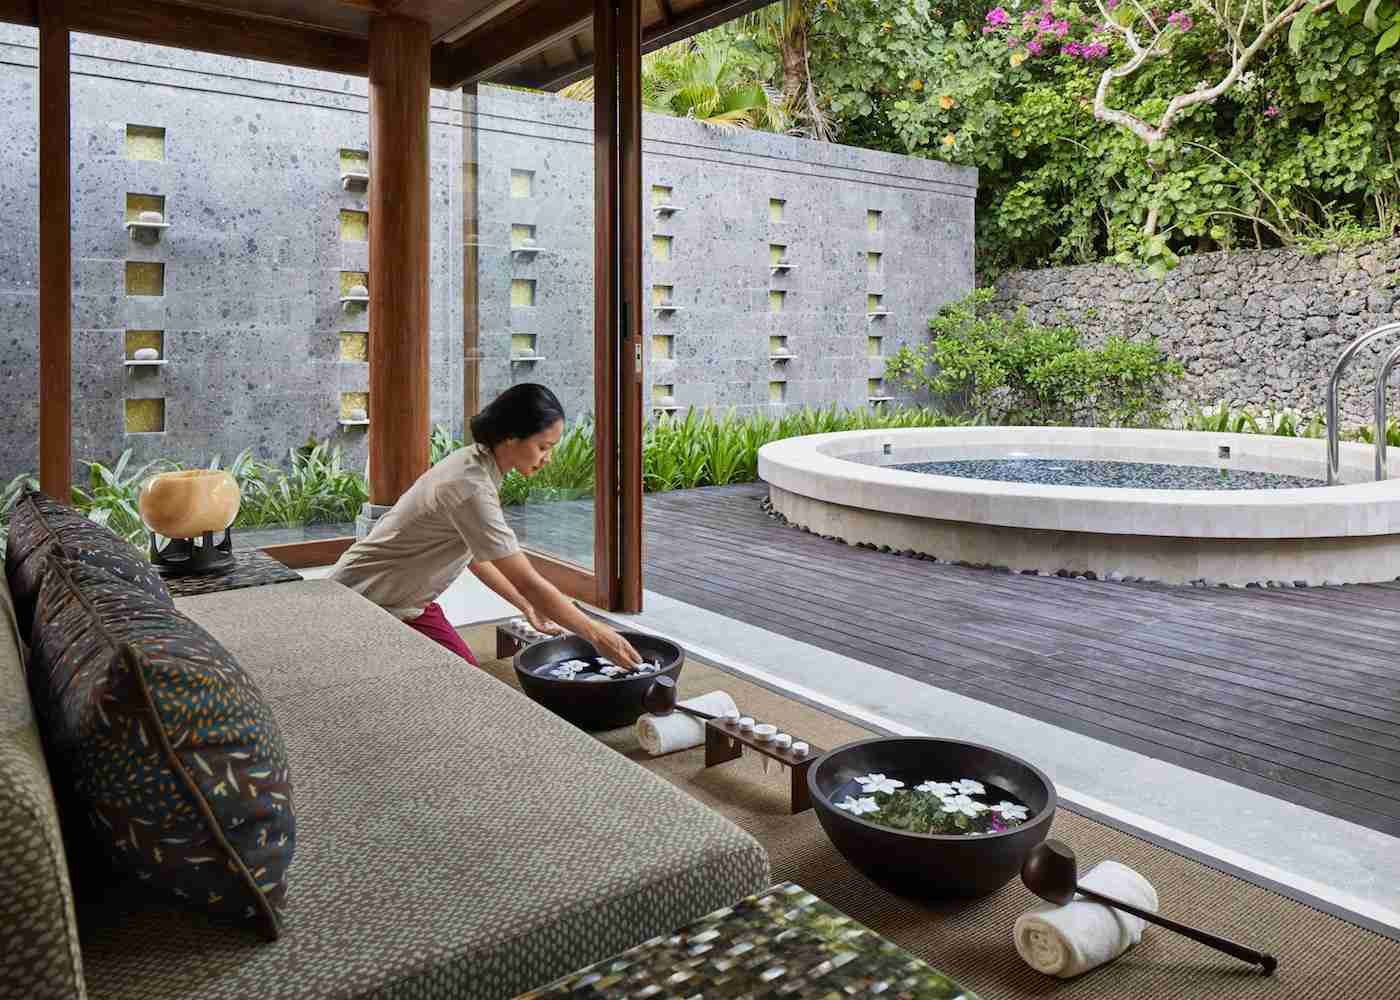 Hyatt Prive Benefits - Hyatt Regency Bali